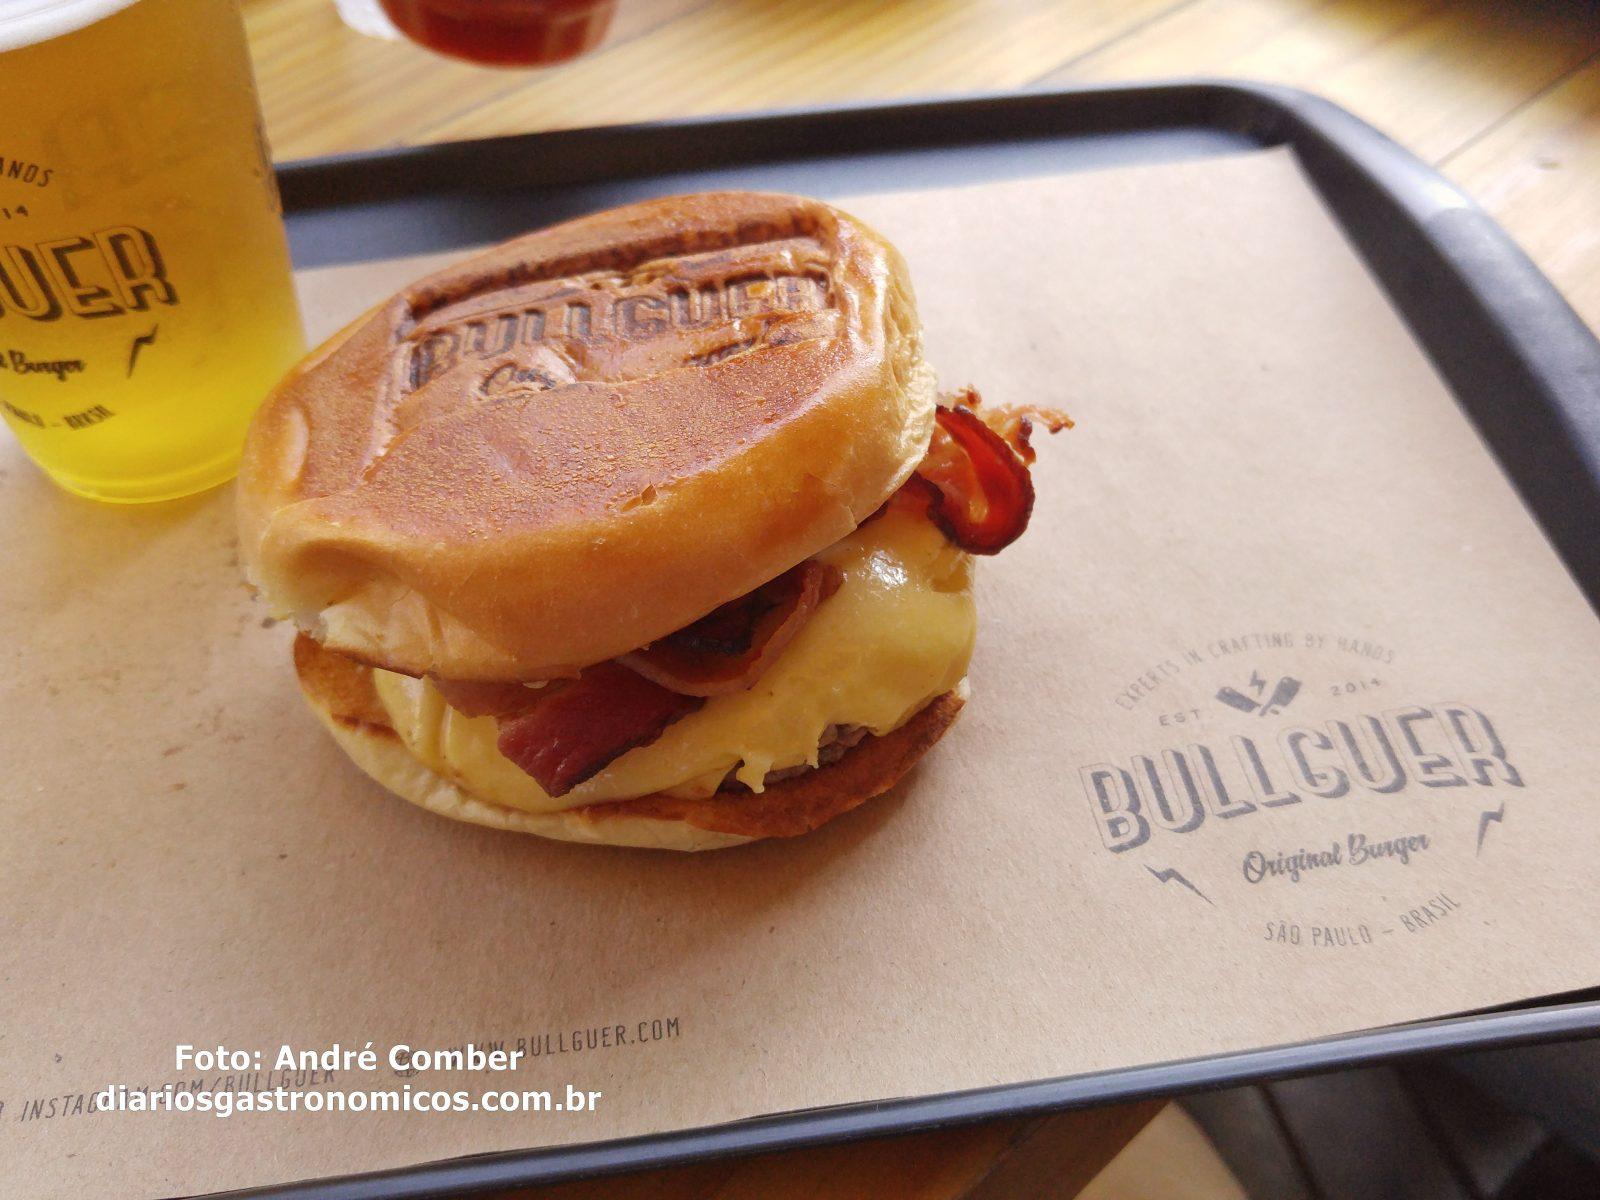 Bullguer, hamburguer